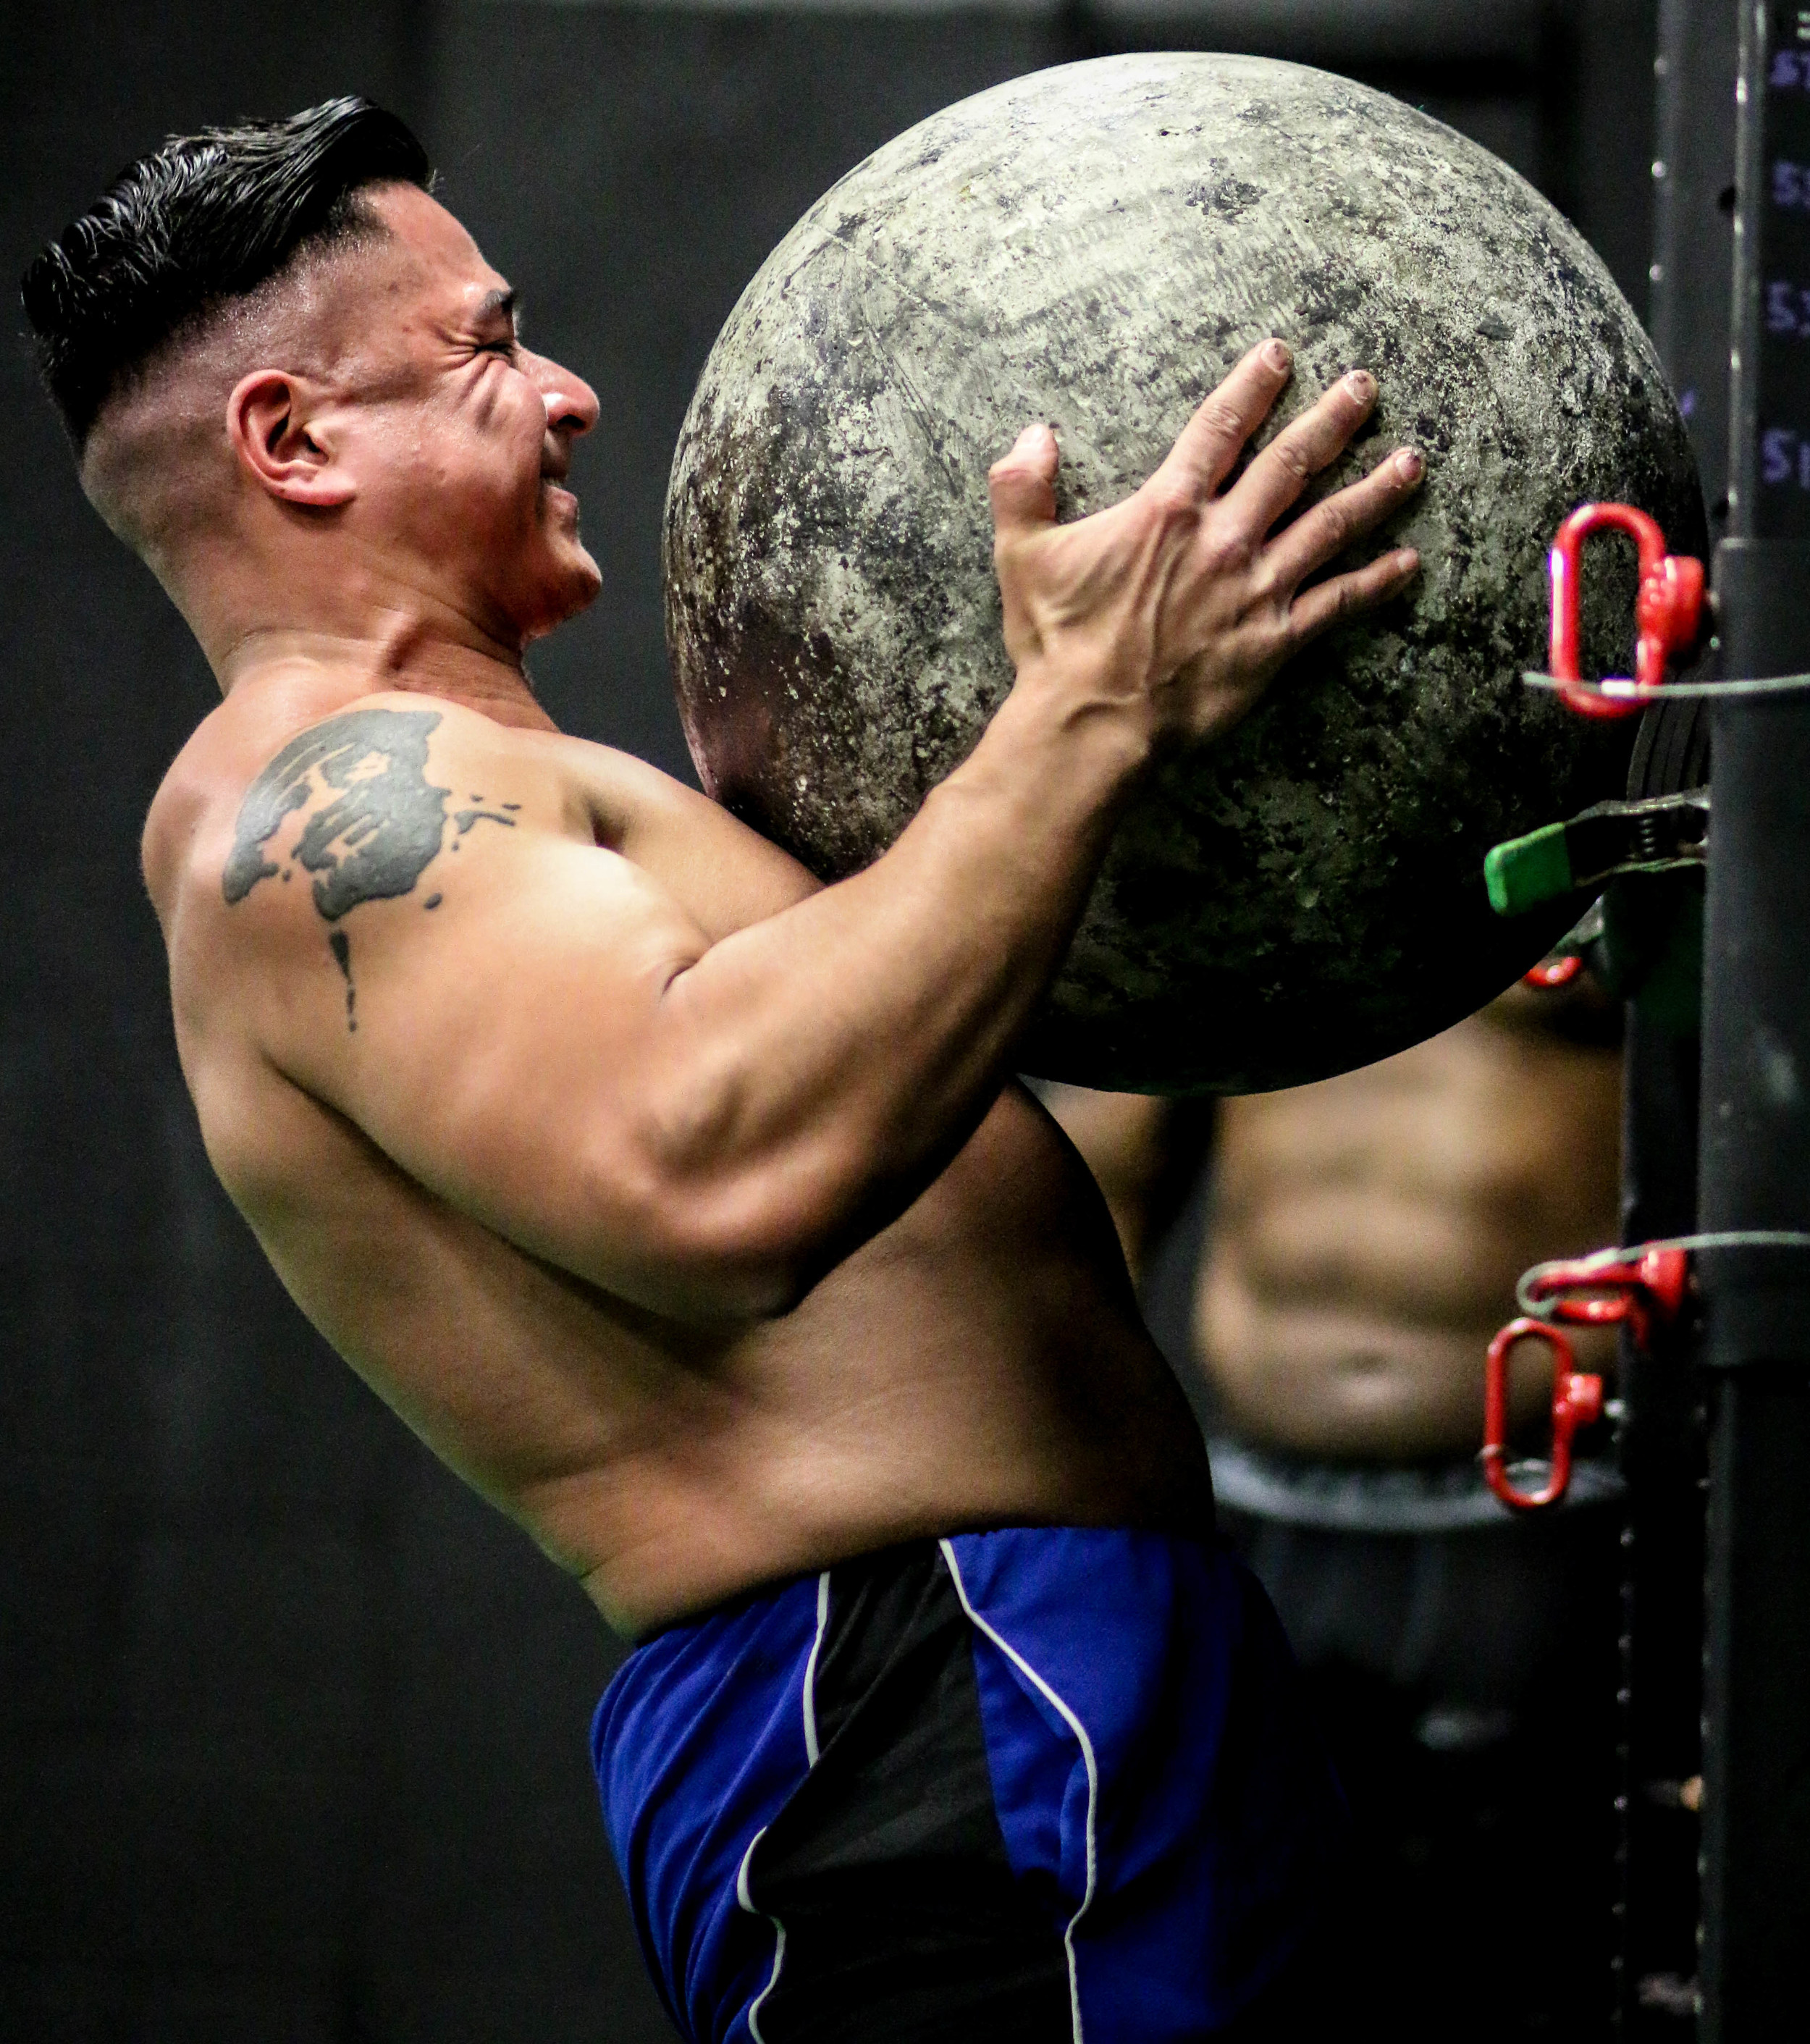 harrison strength_strong man_atlas stones-86.jpg